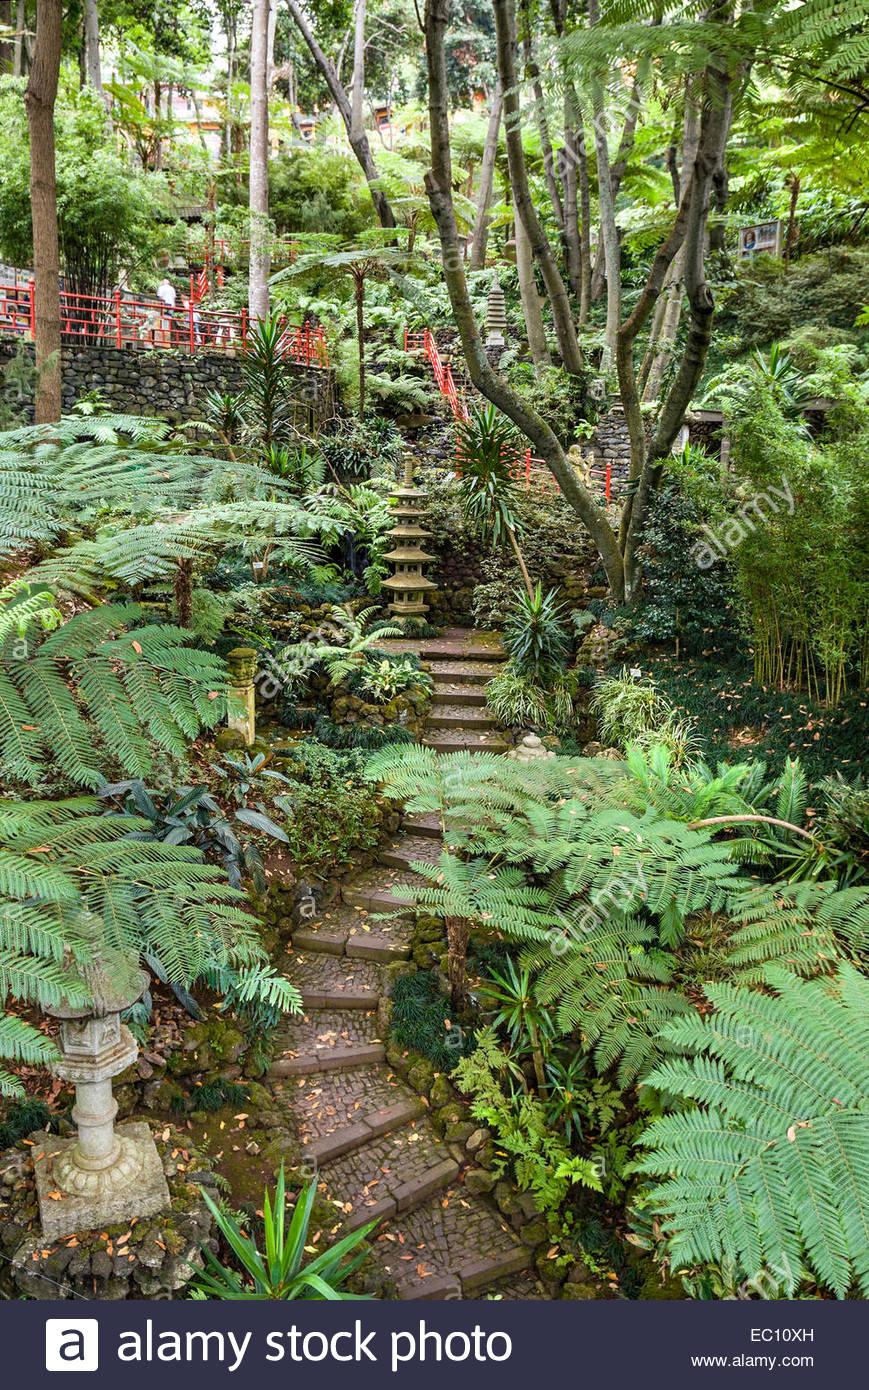 Asiatischer Garten In Den Garten Monte Palace In Funchal Madeira